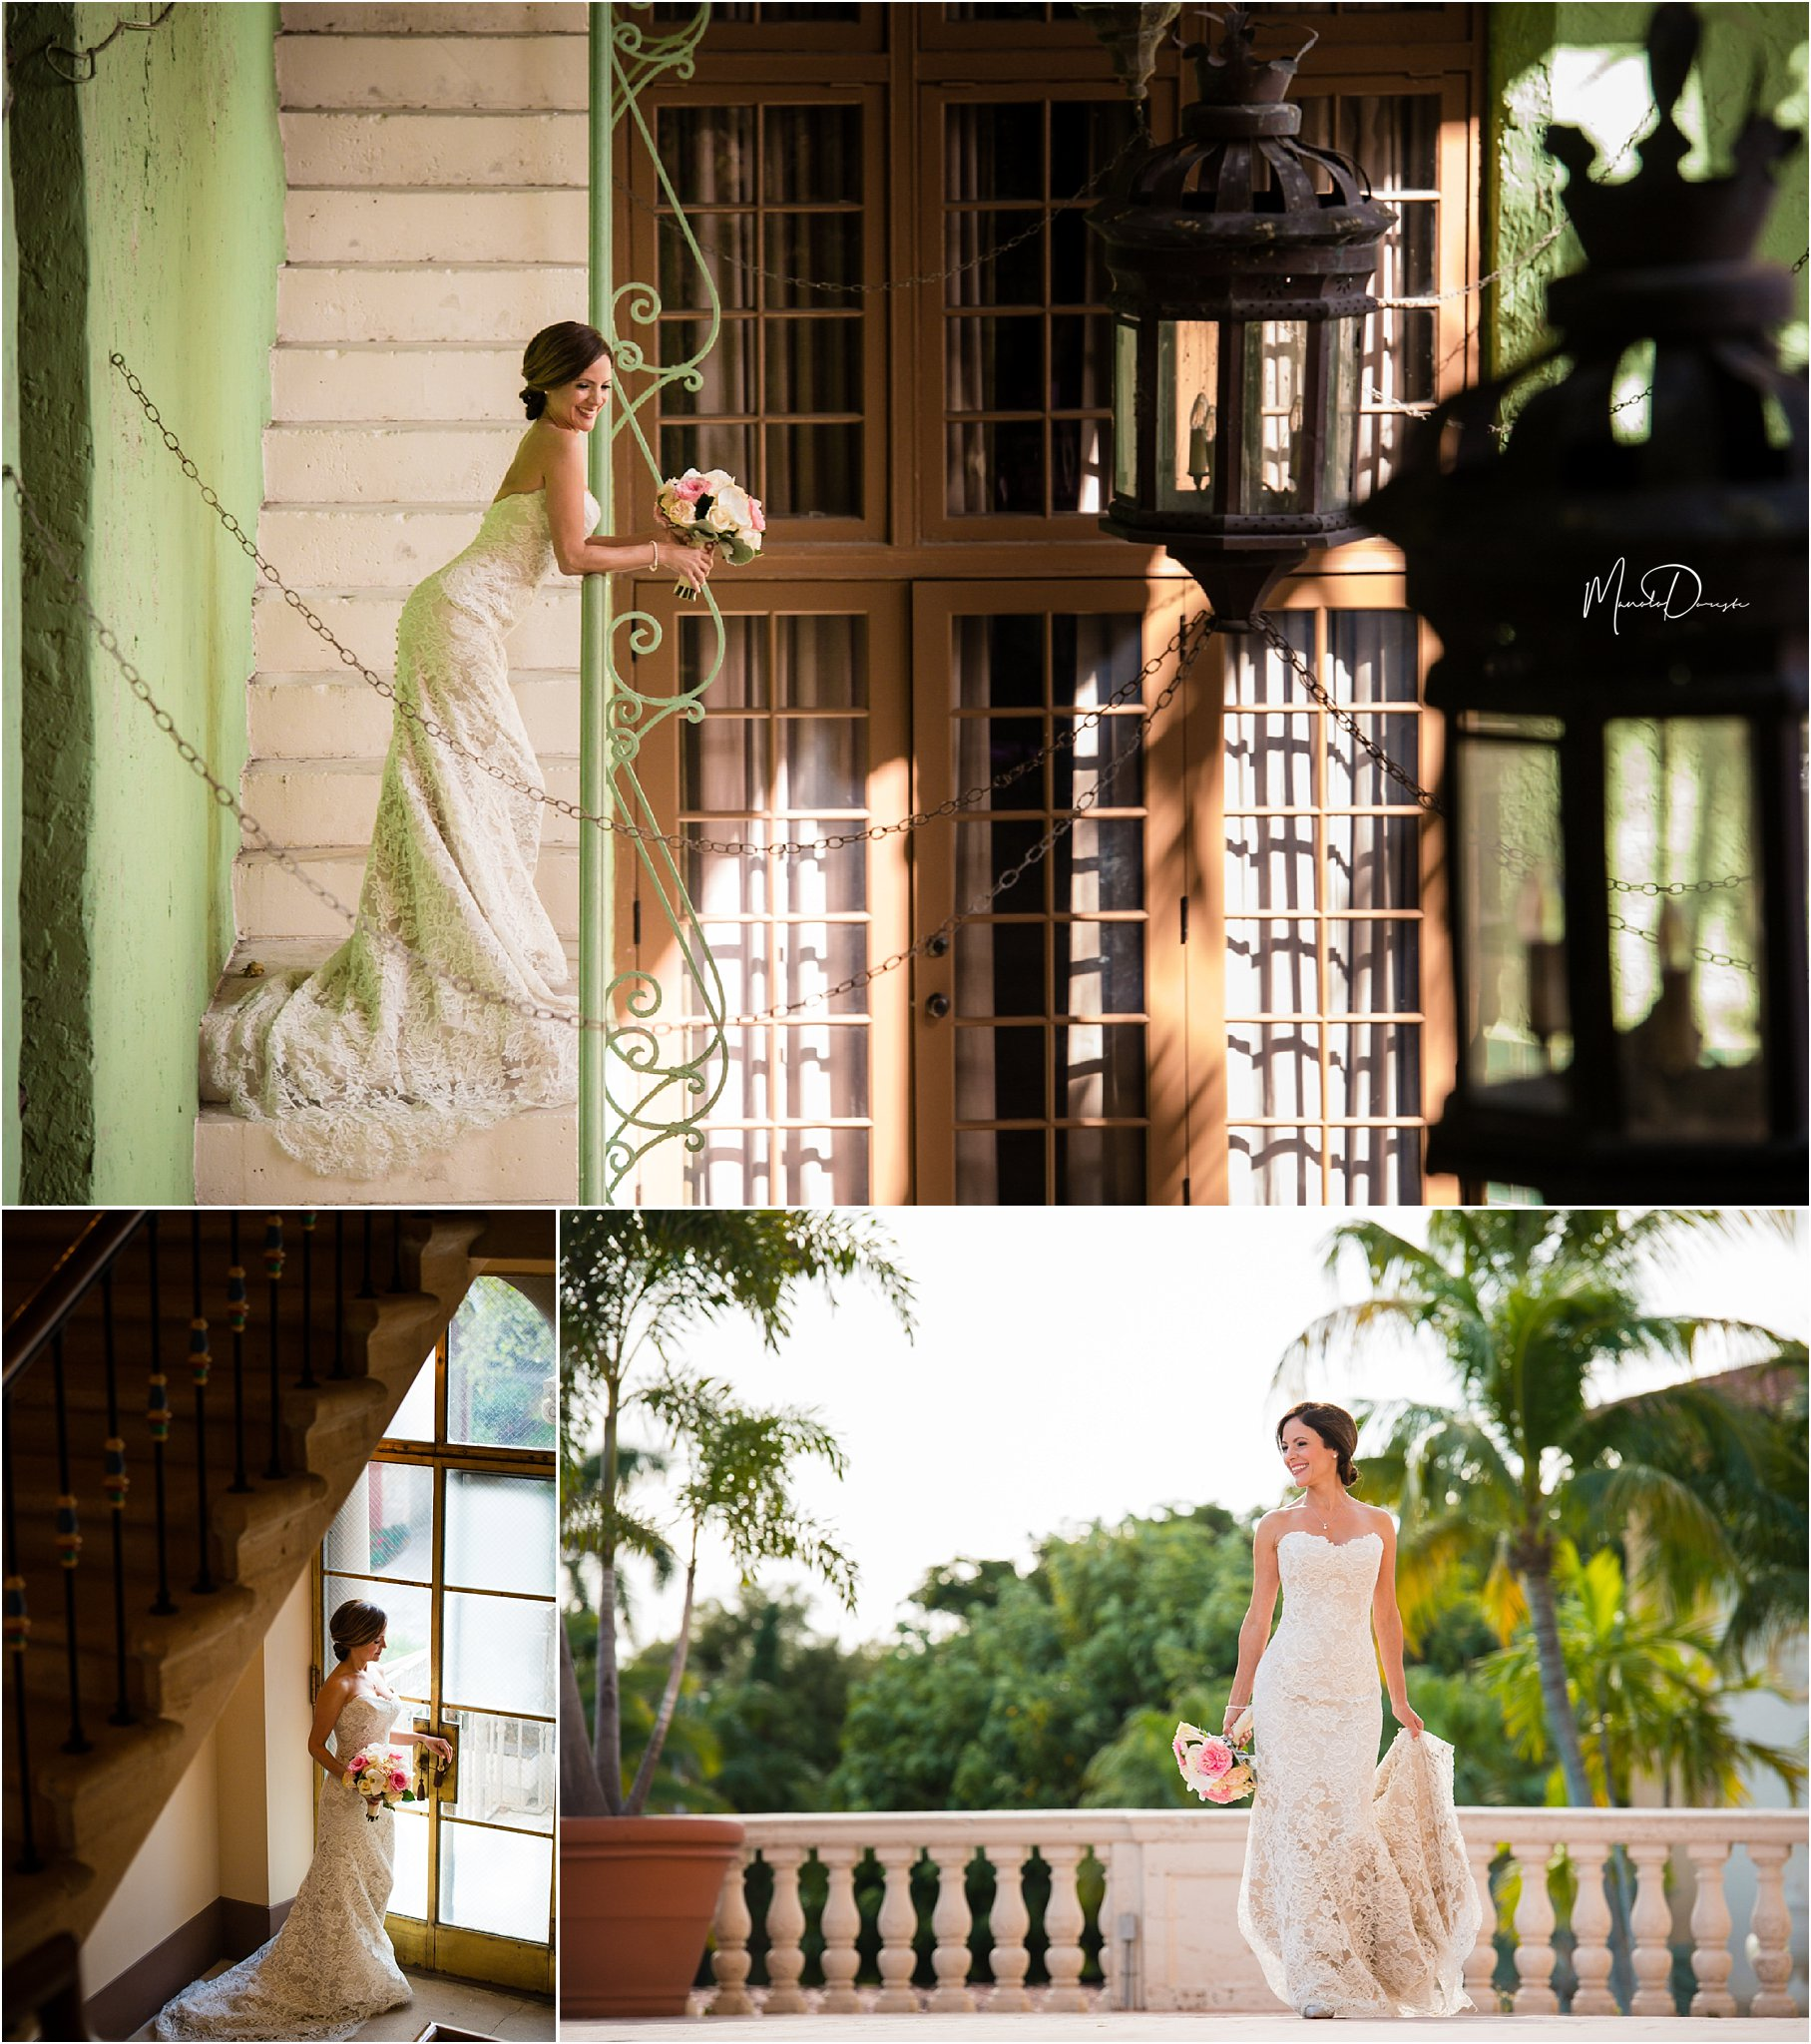 00836_ManoloDoreste_InFocusStudios_Wedding_Family_Photography_Miami_MiamiPhotographer.jpg